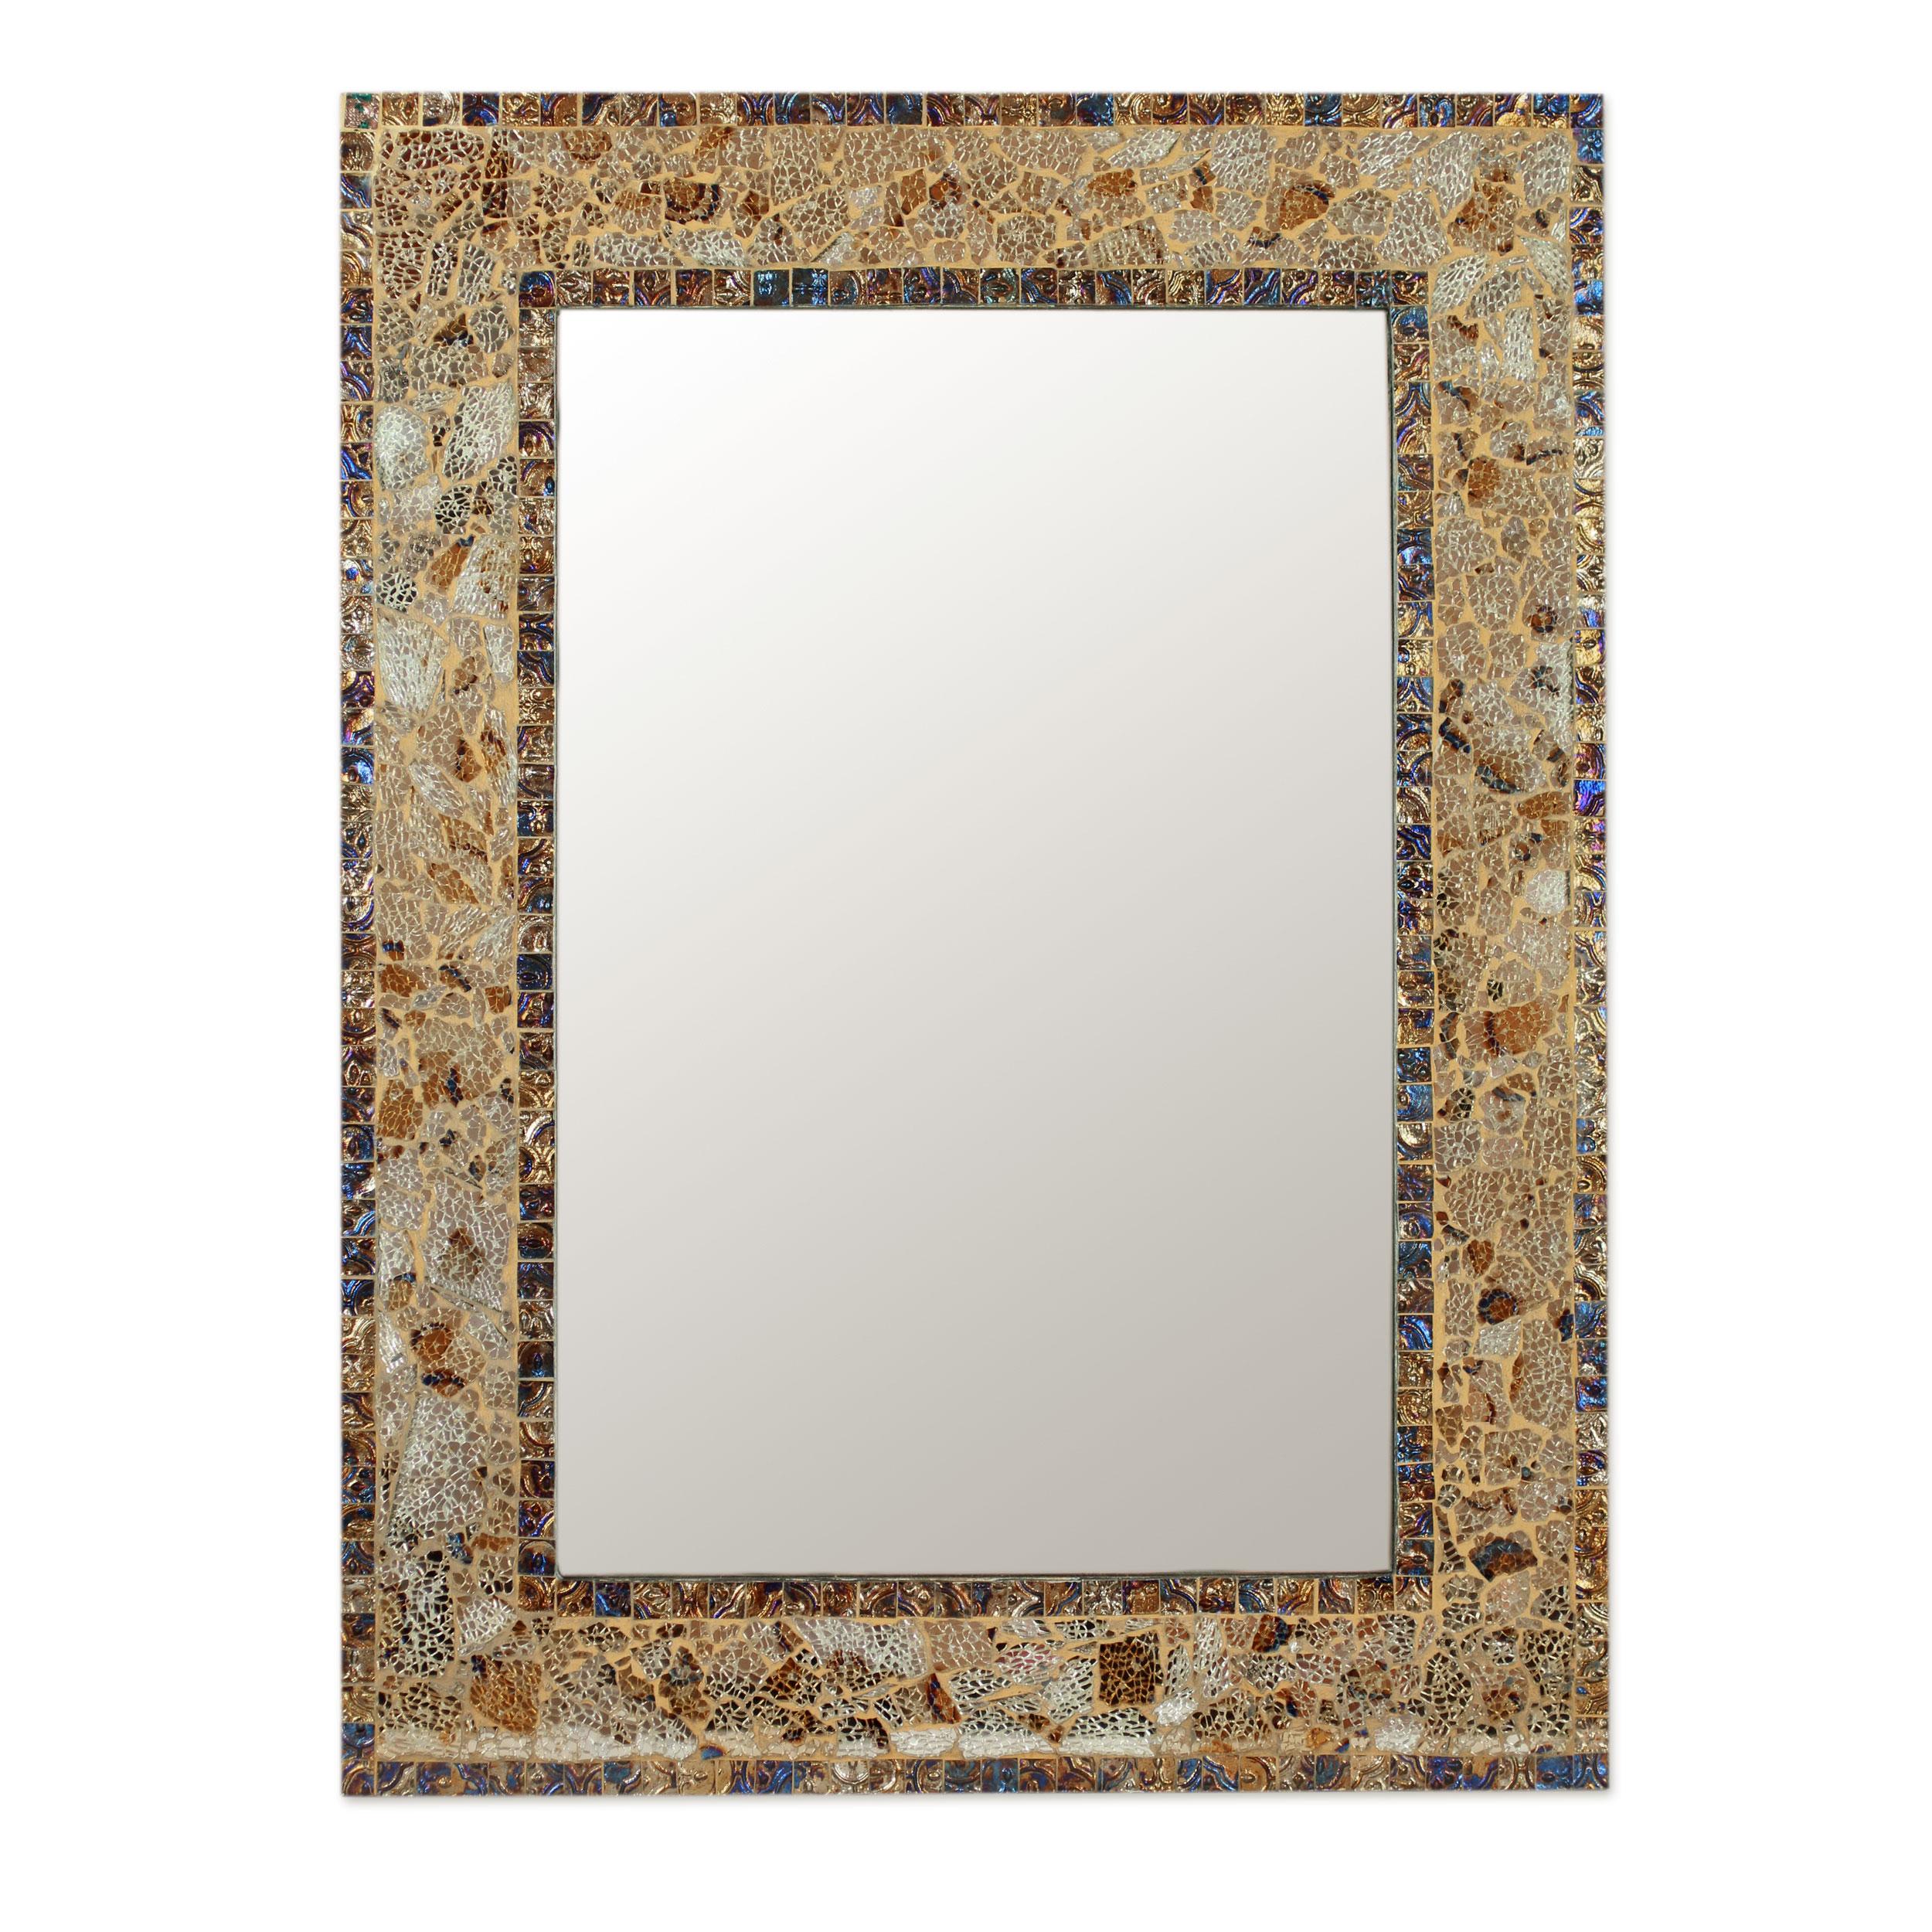 This italian circular wooden wall mirror is no longer available - Mosaic Glass Mirror Persian Mosaic Handmade Mosaic Glass Wall Mirror From India